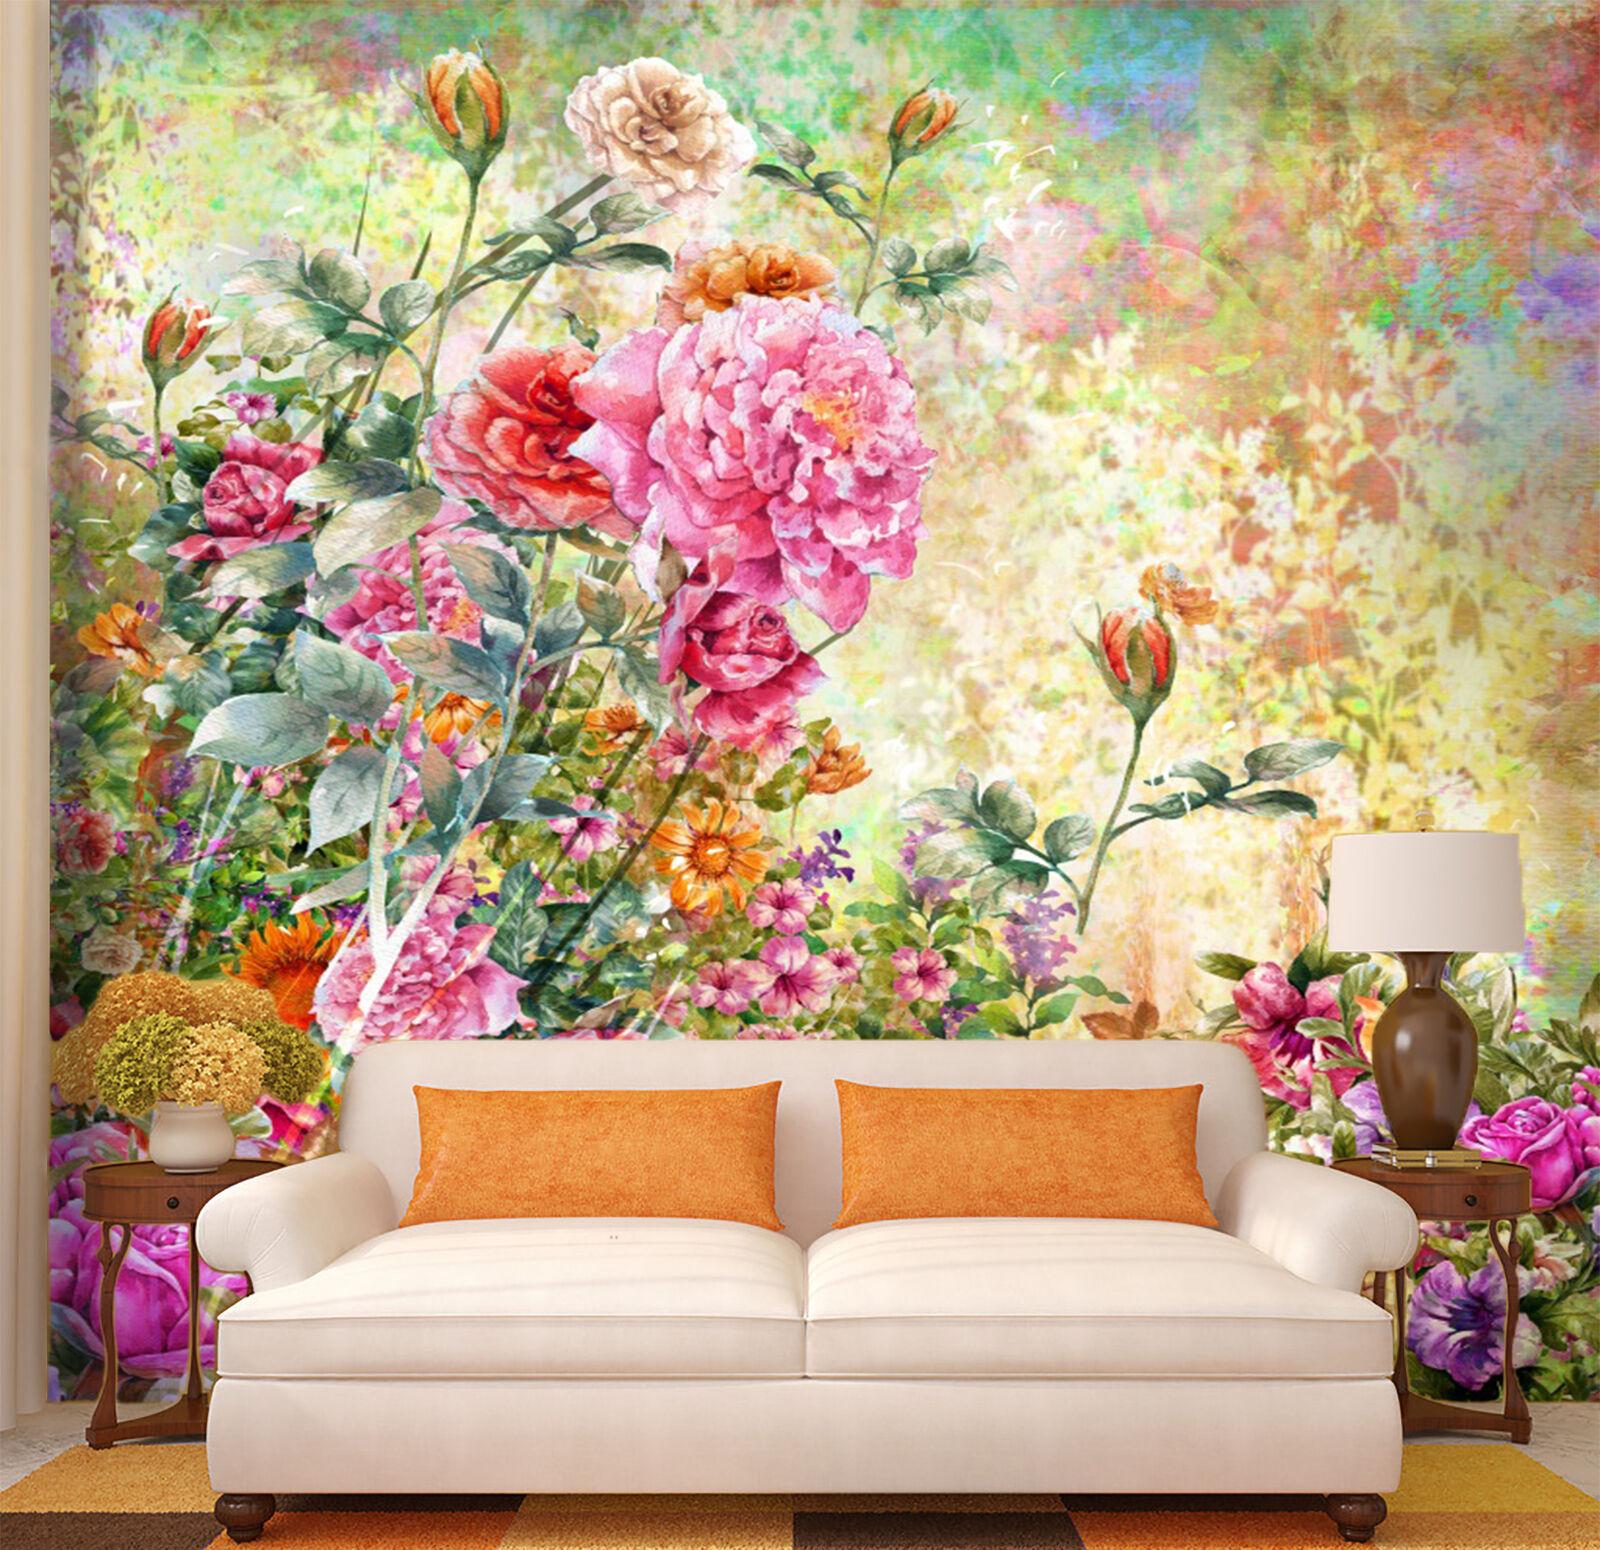 3D Lush Flowers 990 WallPaper Murals Wall Print Decal Wall Deco AJ WALLPAPER